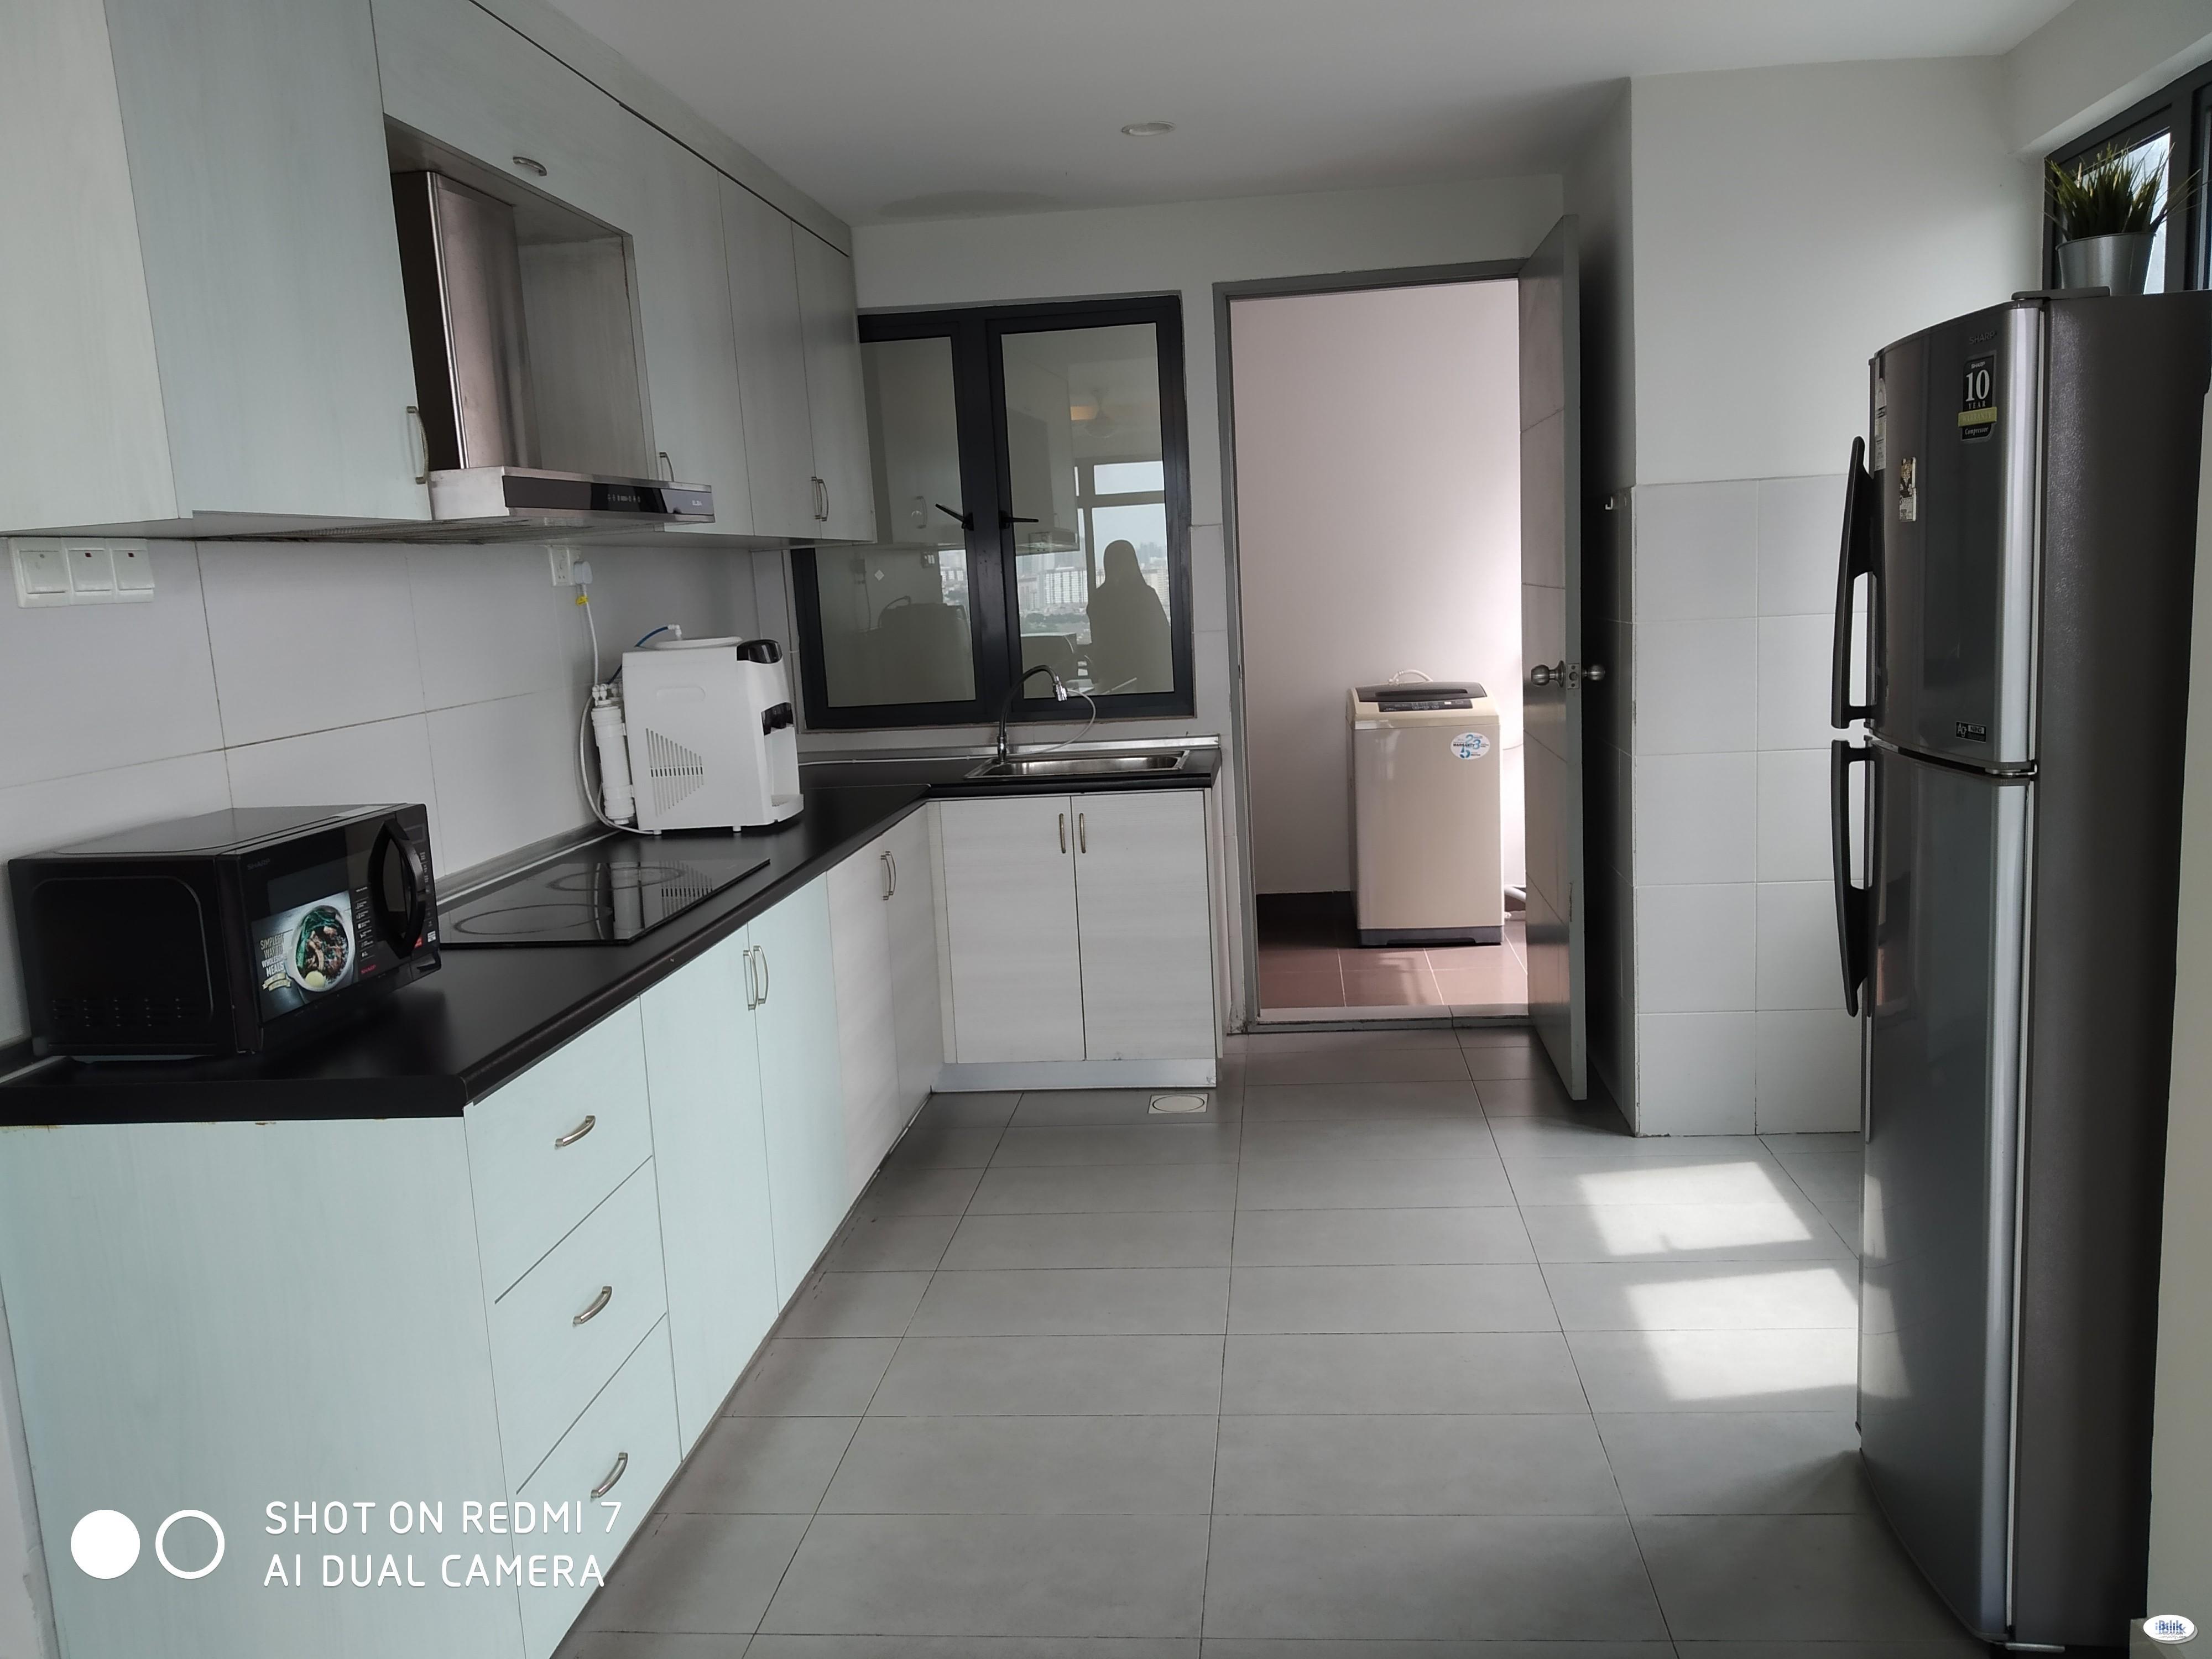 Single Room at DK Senza, Bandar Sunway